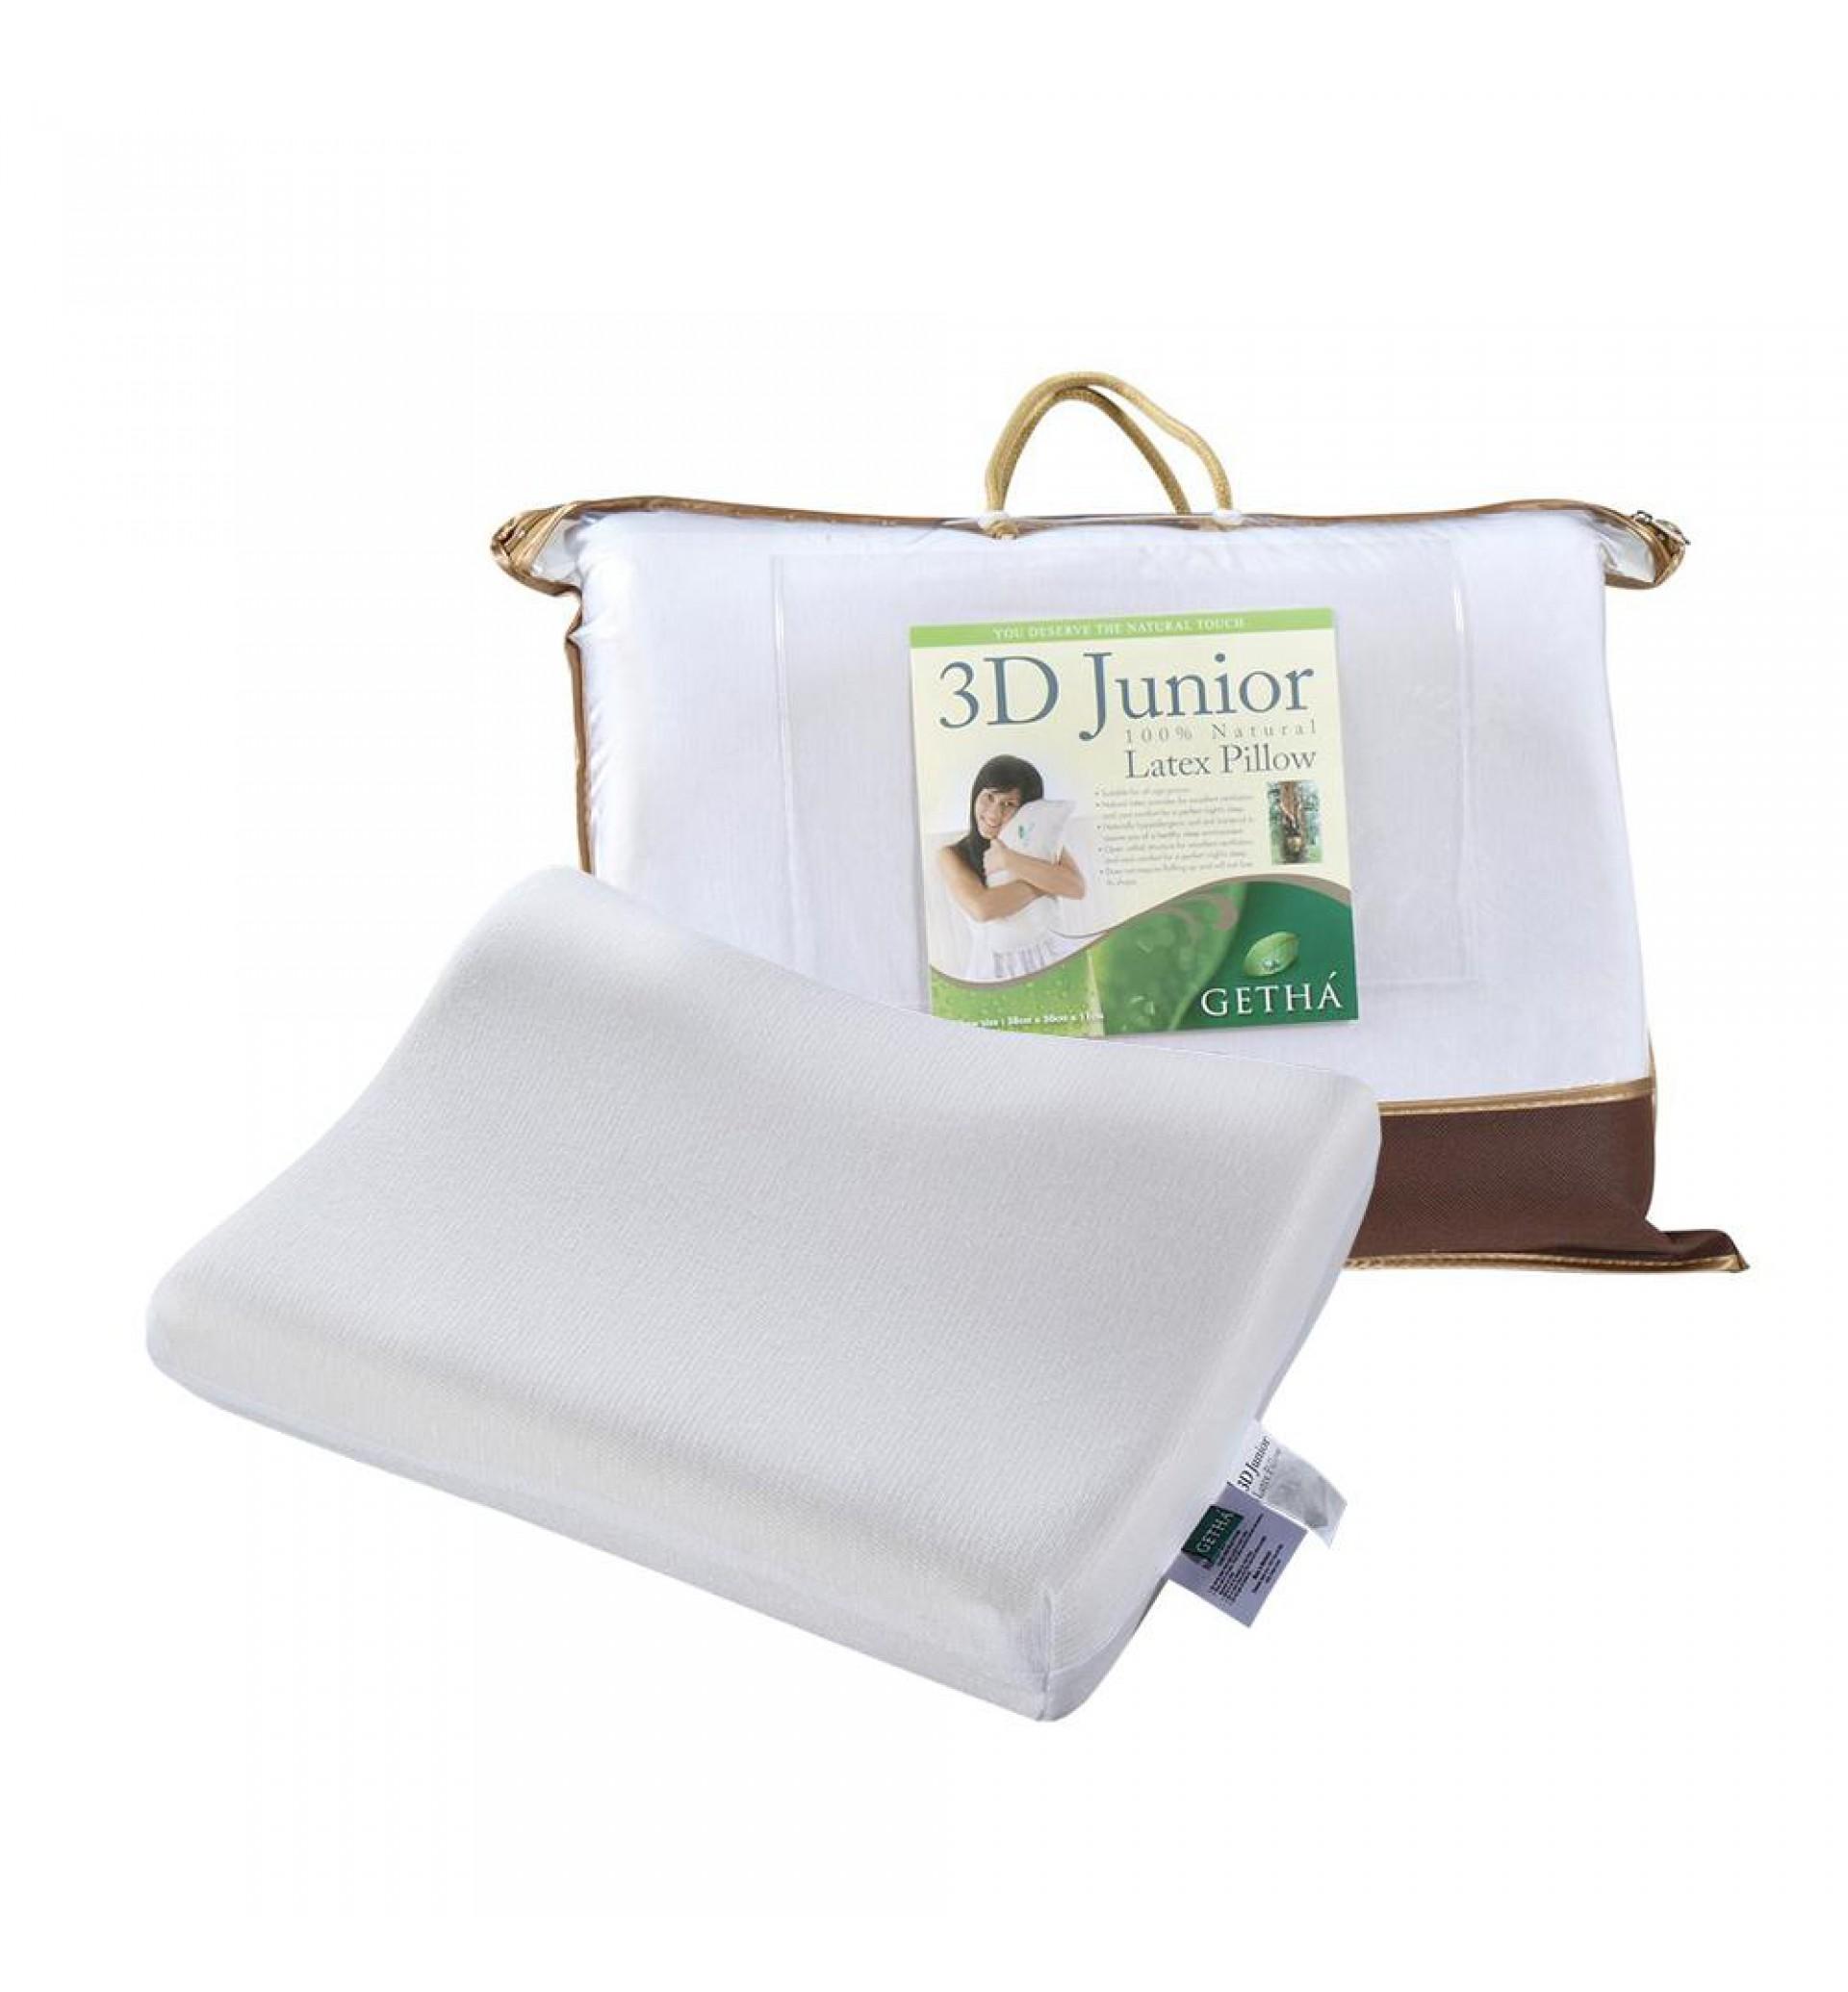 Getha 3D Junior Latex Pillow